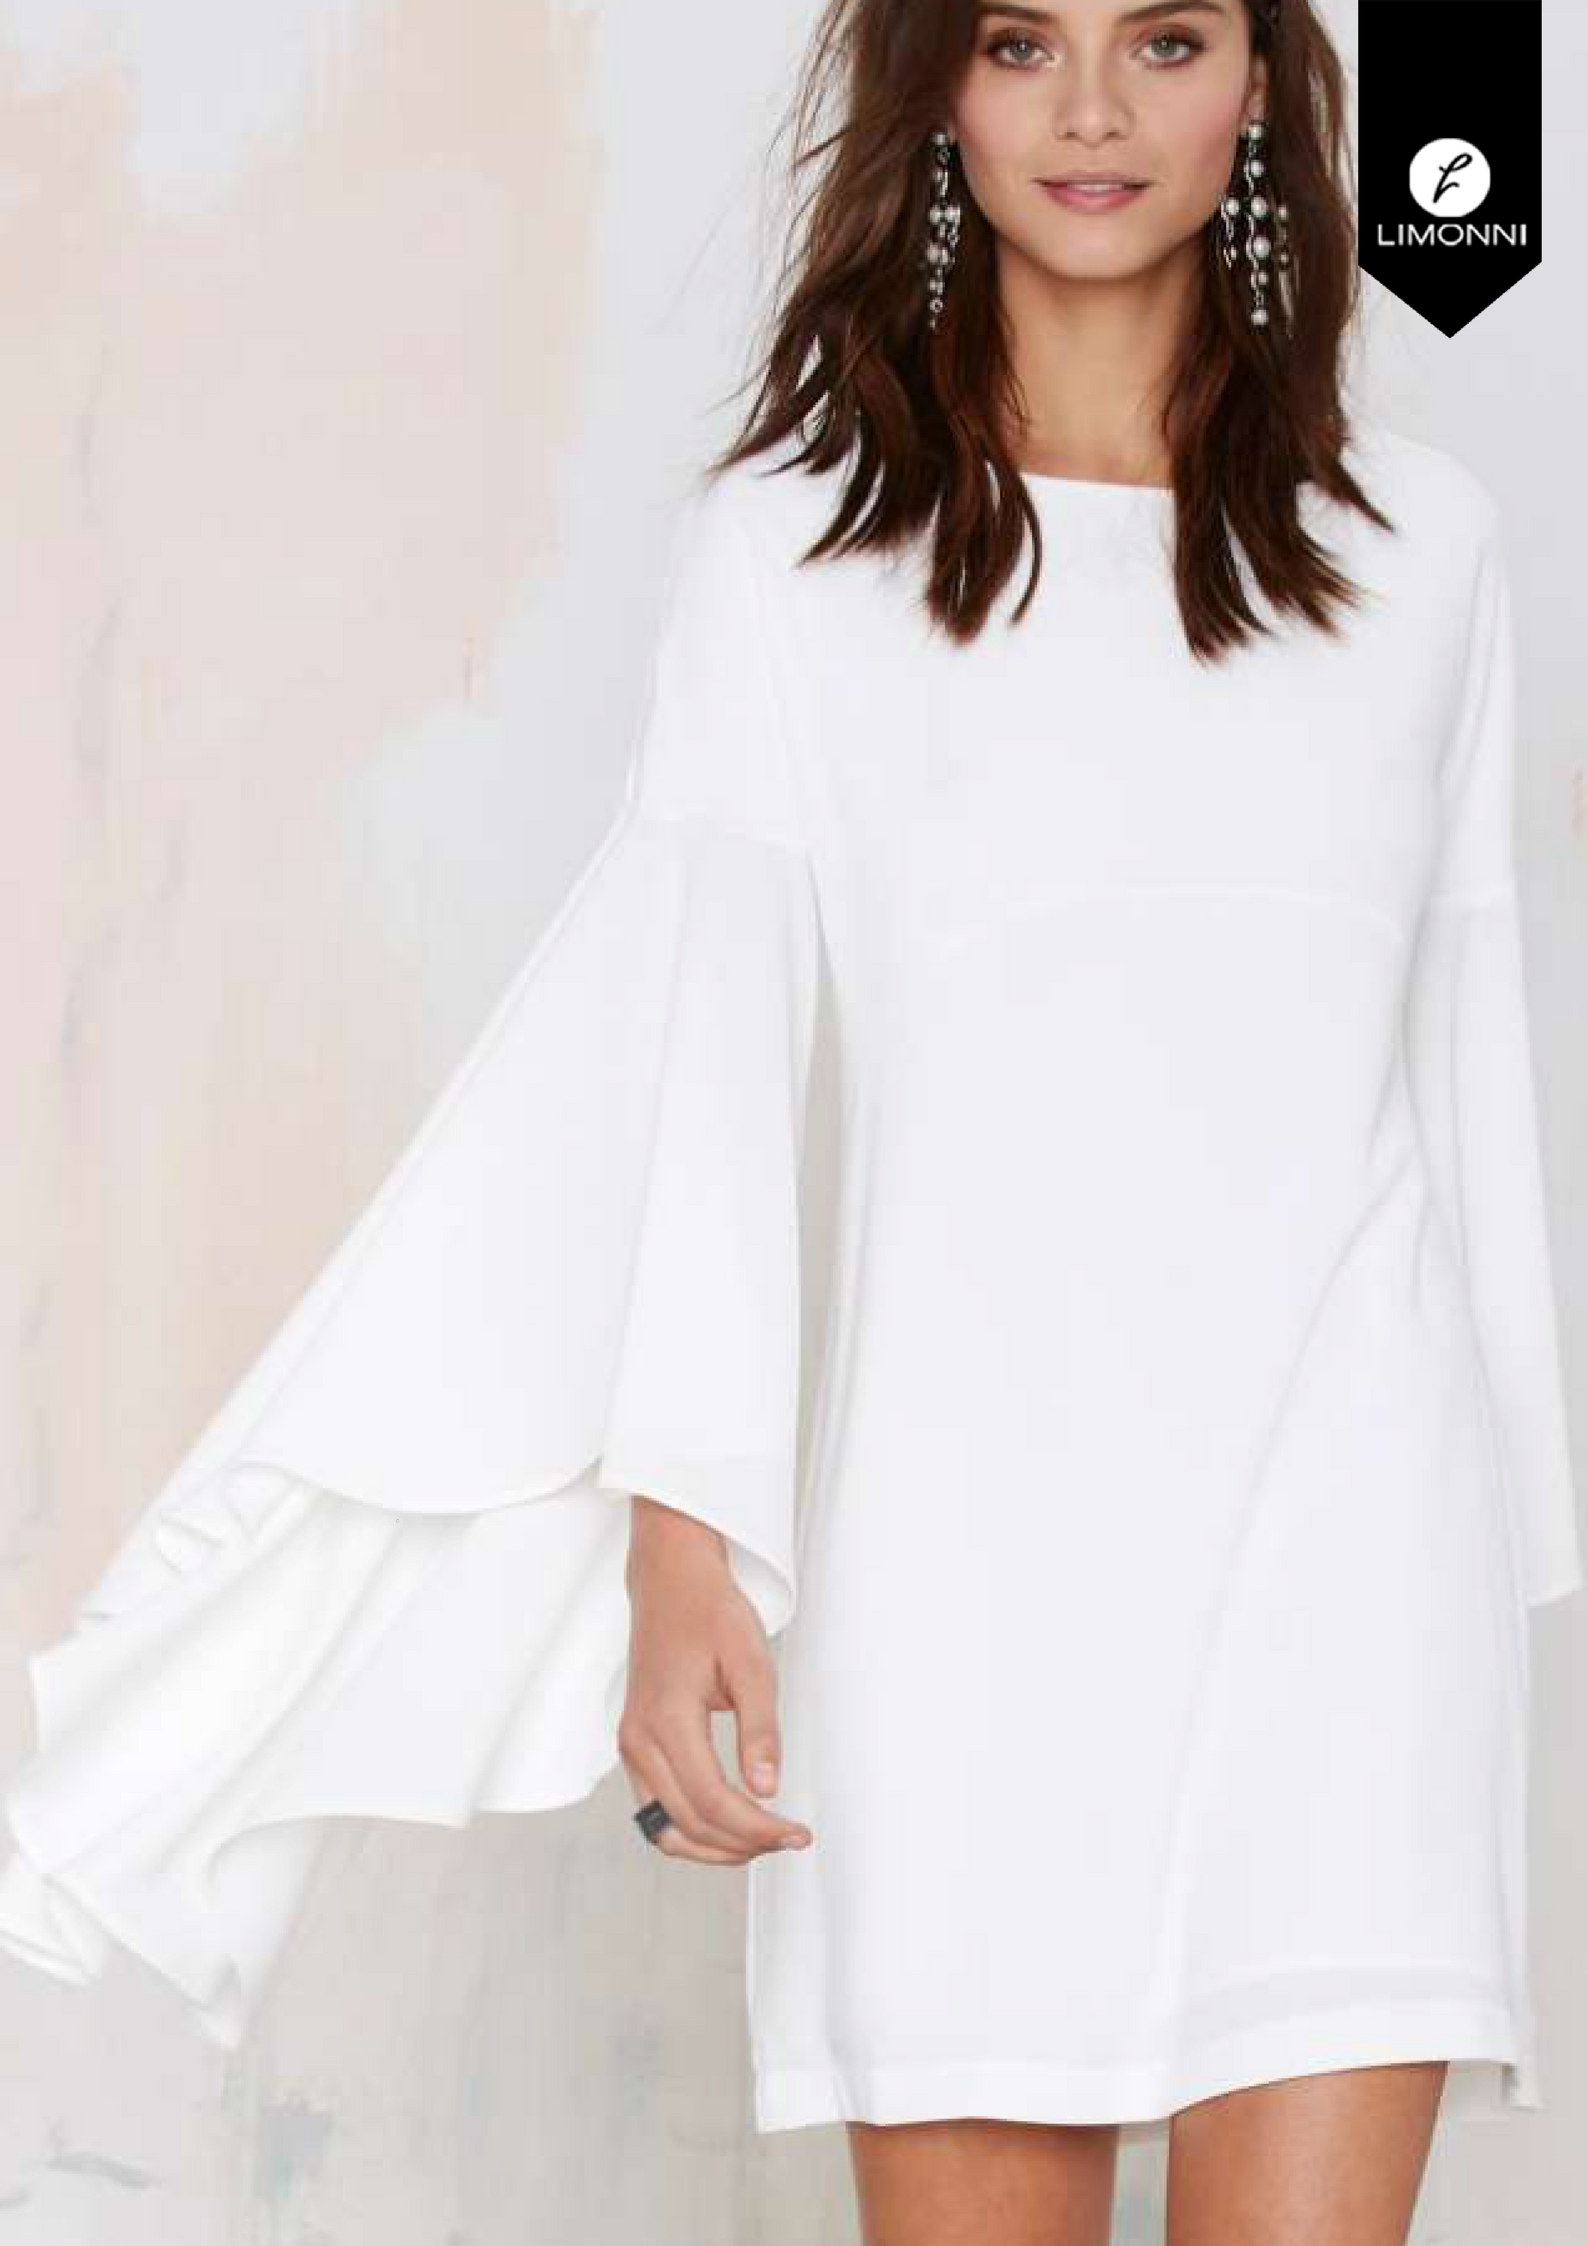 Vestidos para mujer Limonni Limonni LI1412 Cortos elegantes